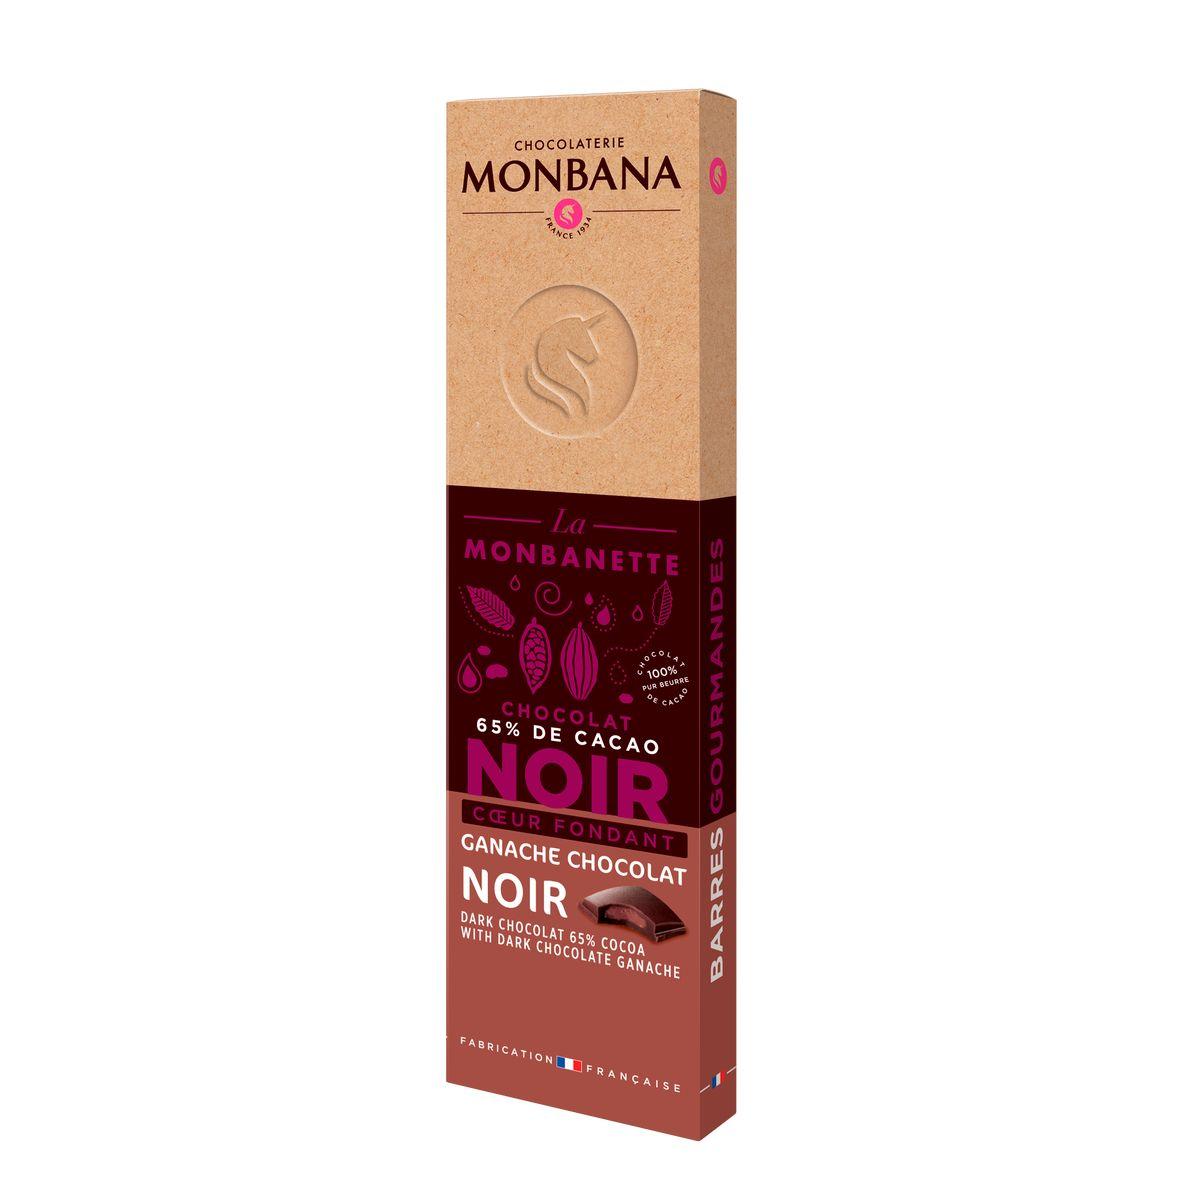 Barre de chocolat noir coeur ganache fondante 40g - Monbana